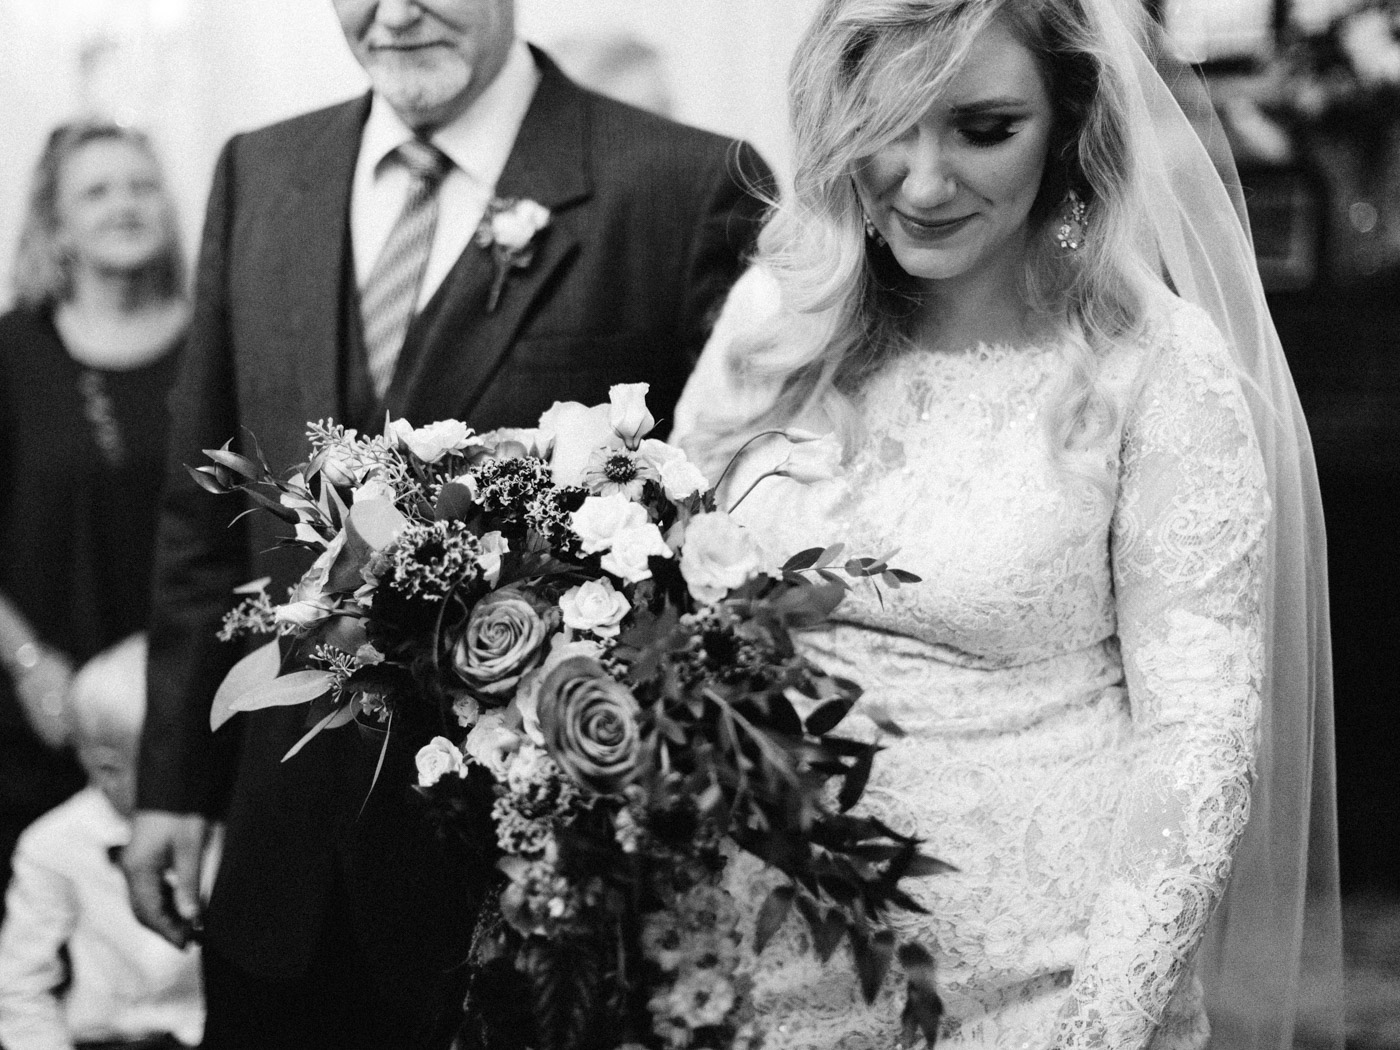 Toronto-wedding-photographer-intimate-classic-fine-art-elopement-ottawa26.jpg